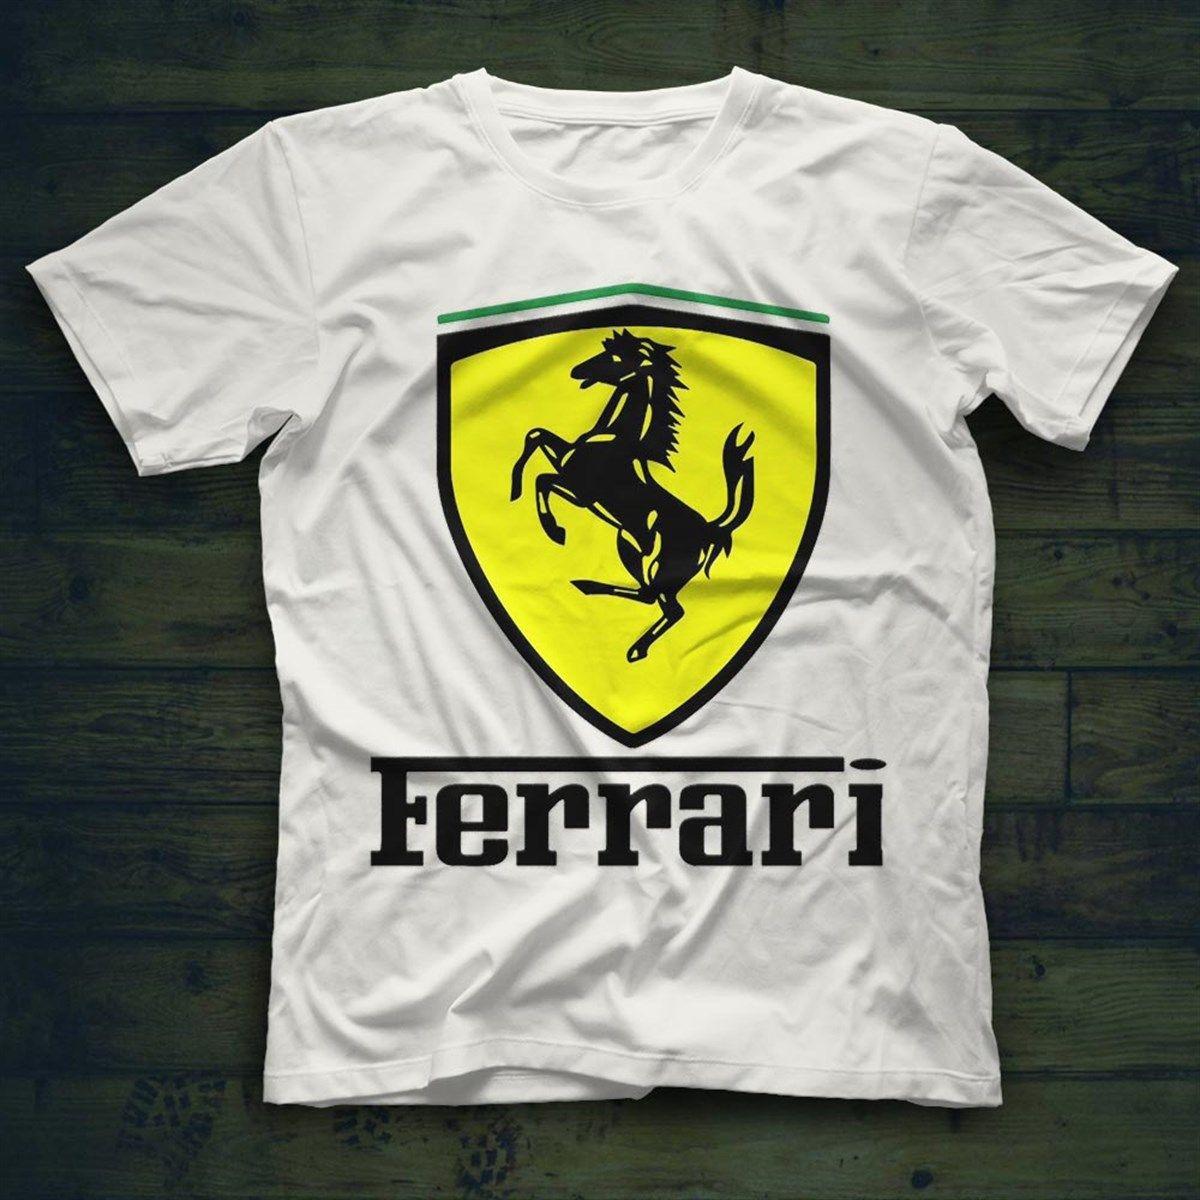 Ferrari White Unisex T Shirt Tees Shirts T Shirt Shirts Tee Shirts